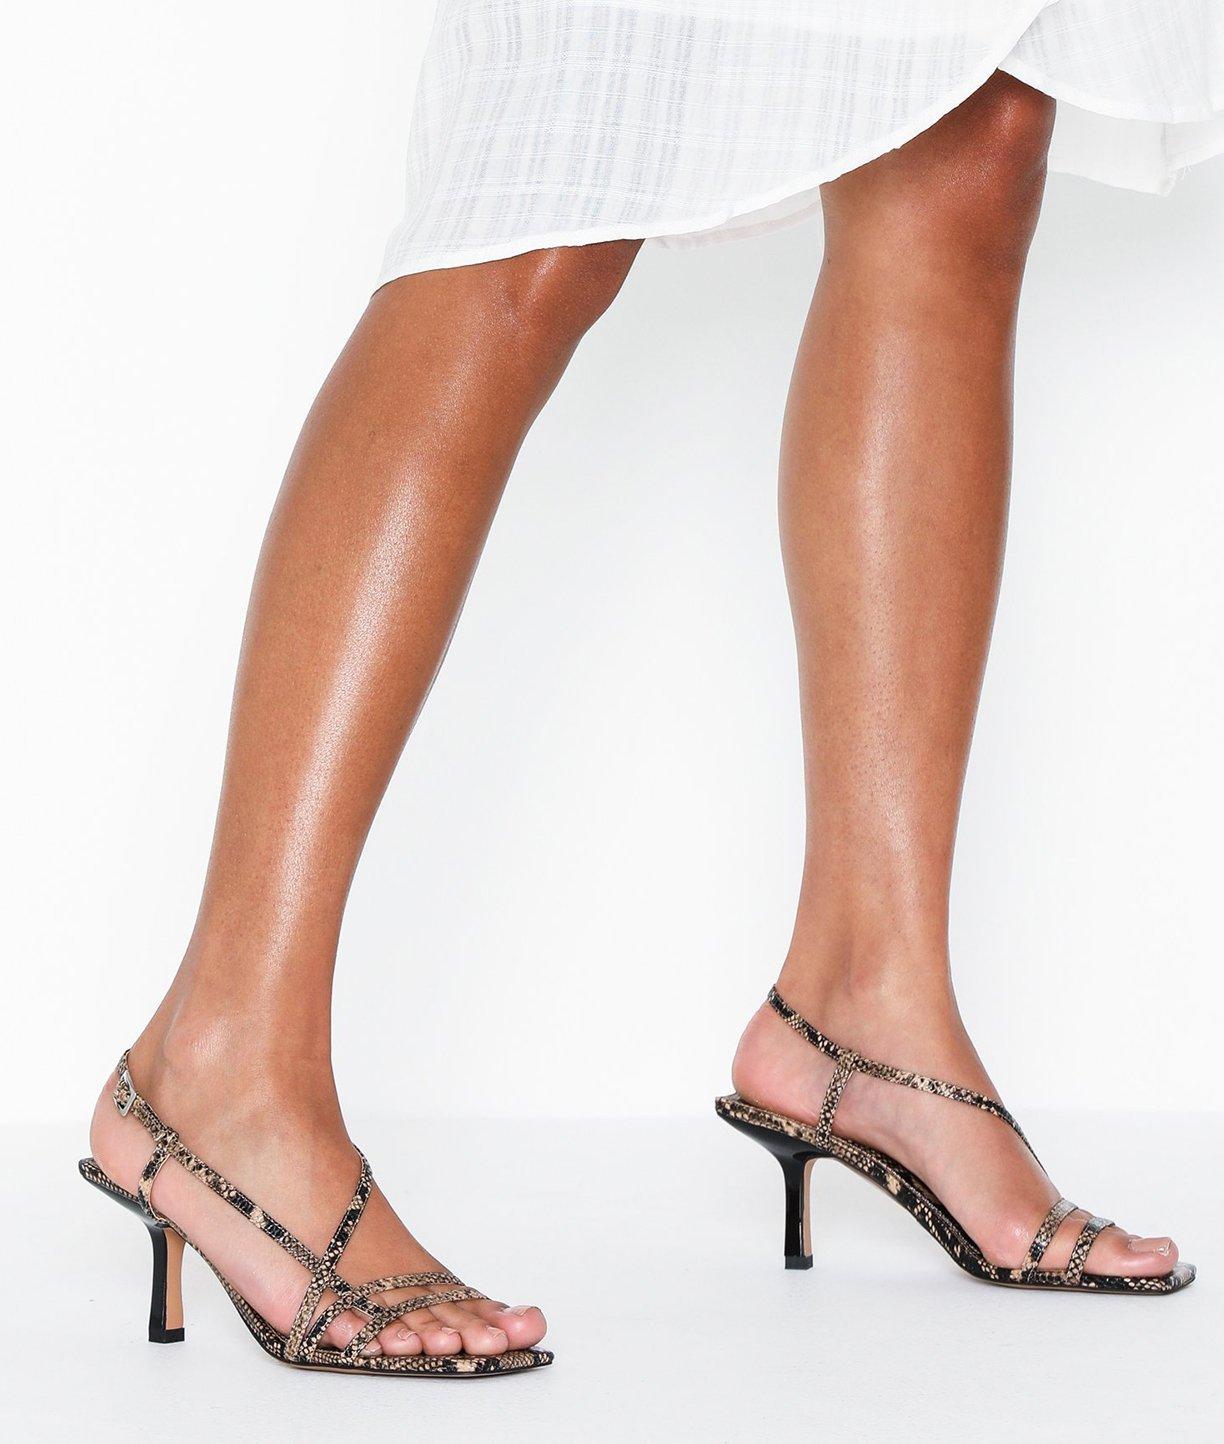 e7db0b72028 Shoes Online - Shop Shoes Online At Nelly.com